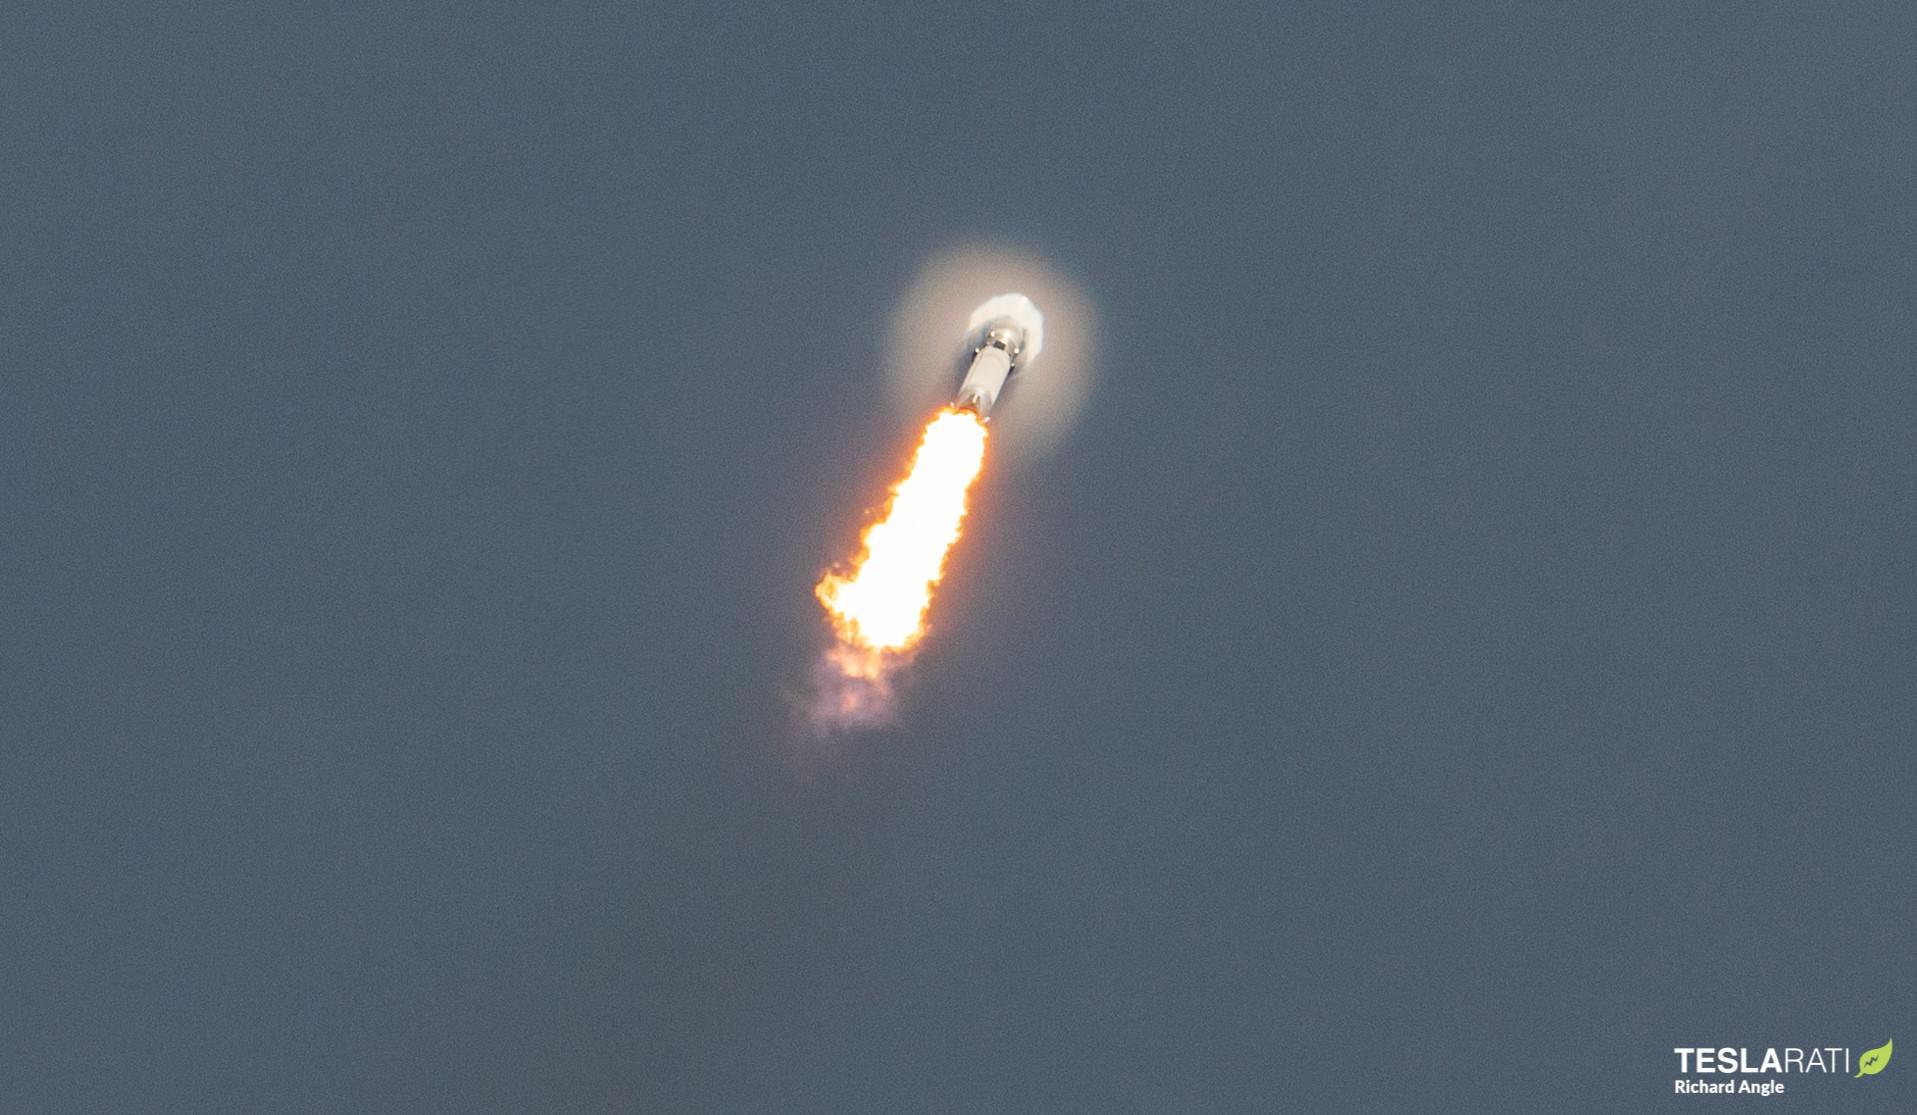 GPS III SV05 Falcon 9 B1062 LC40 061721 (Richard Angle) launch 1 crop (c)